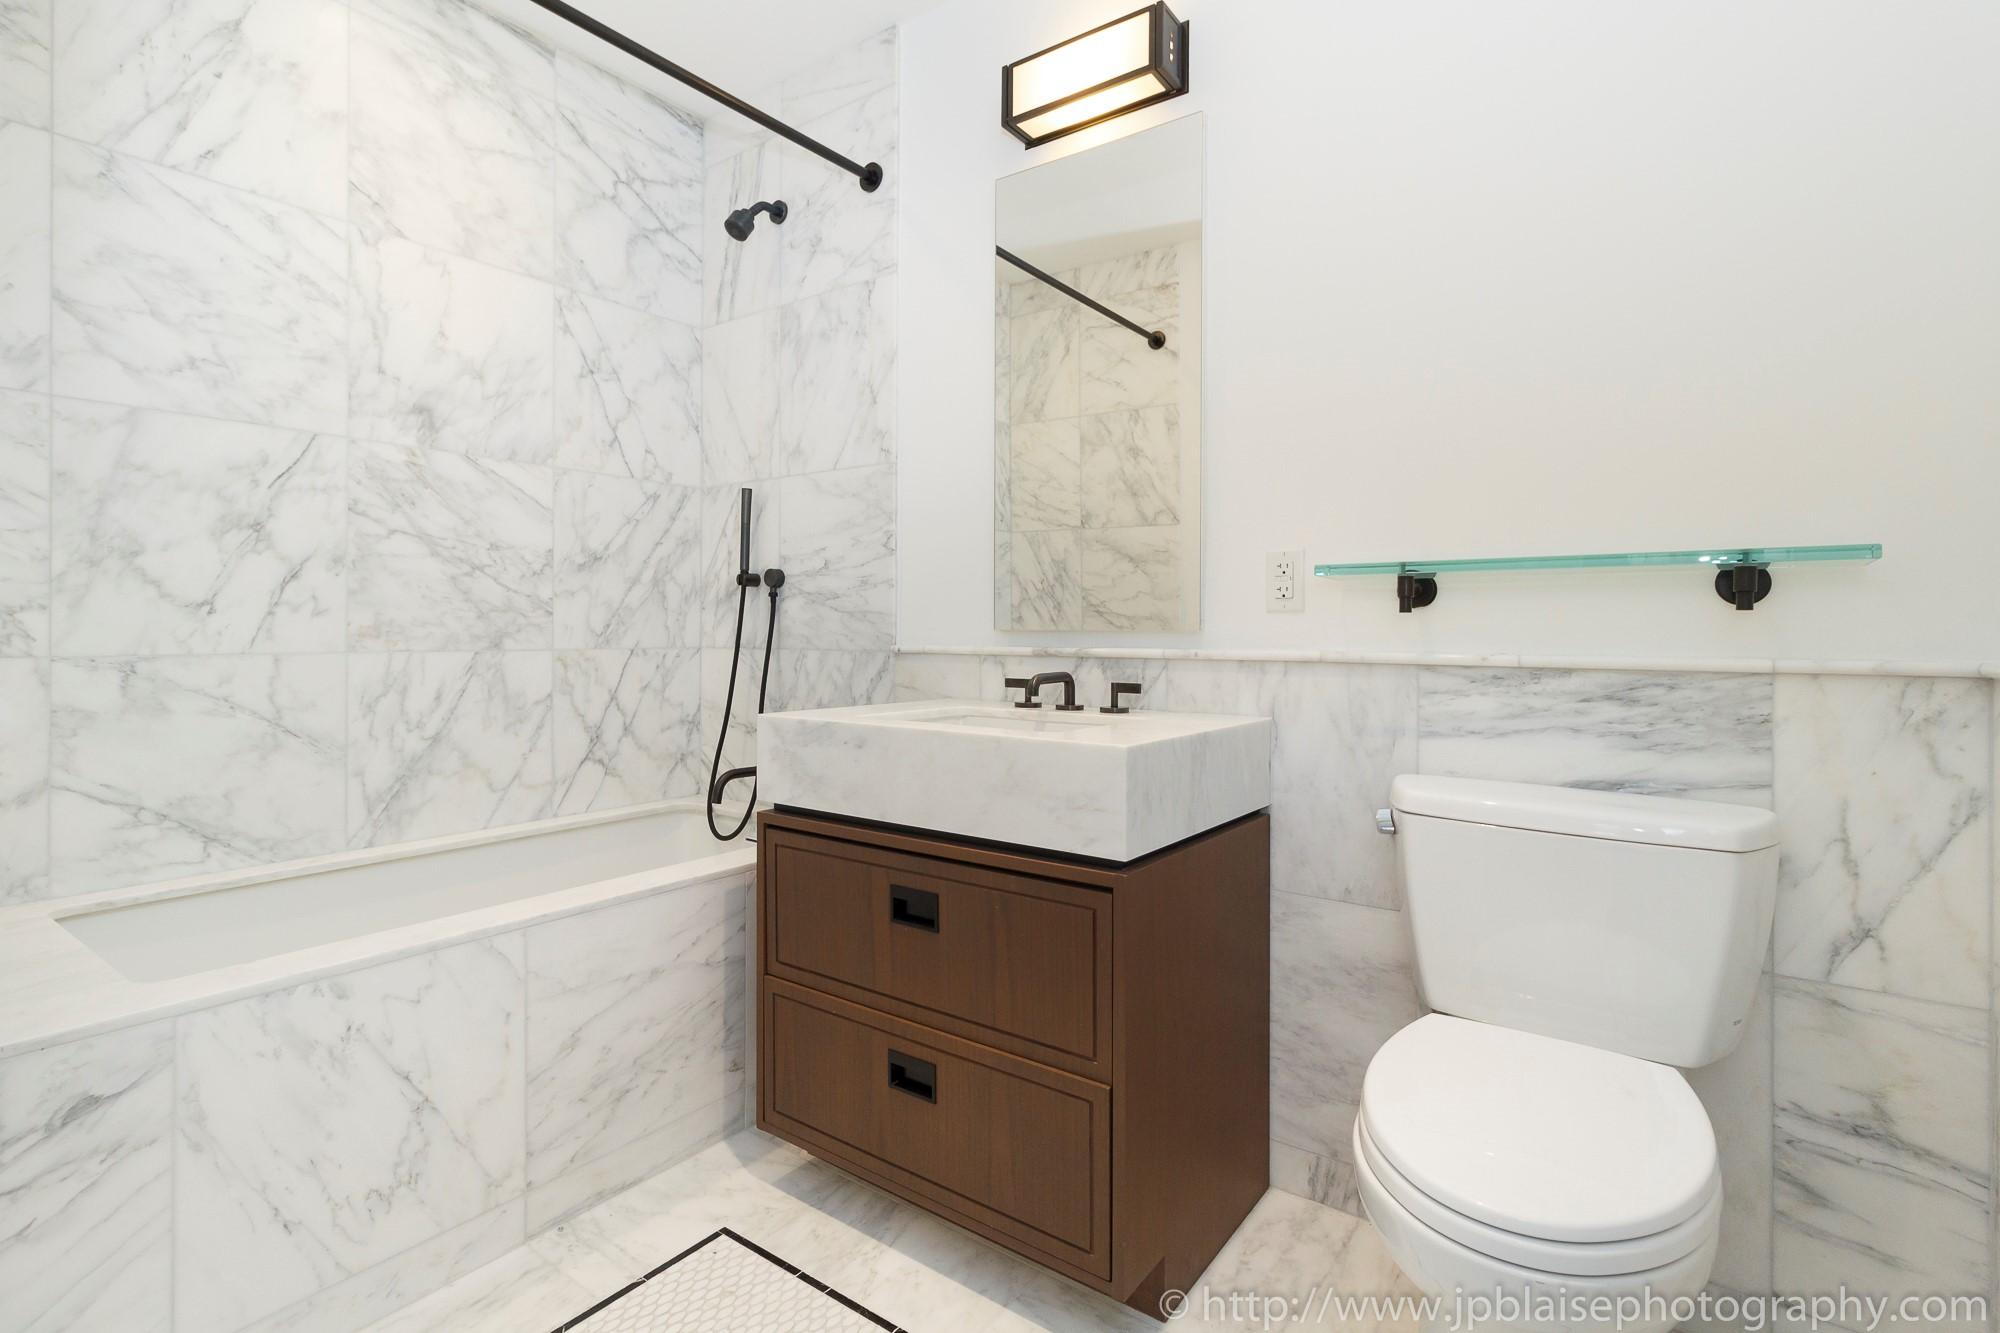 New York Apartment Photographer one bedroom condo manhattan flatiron district NY NYC bathroom